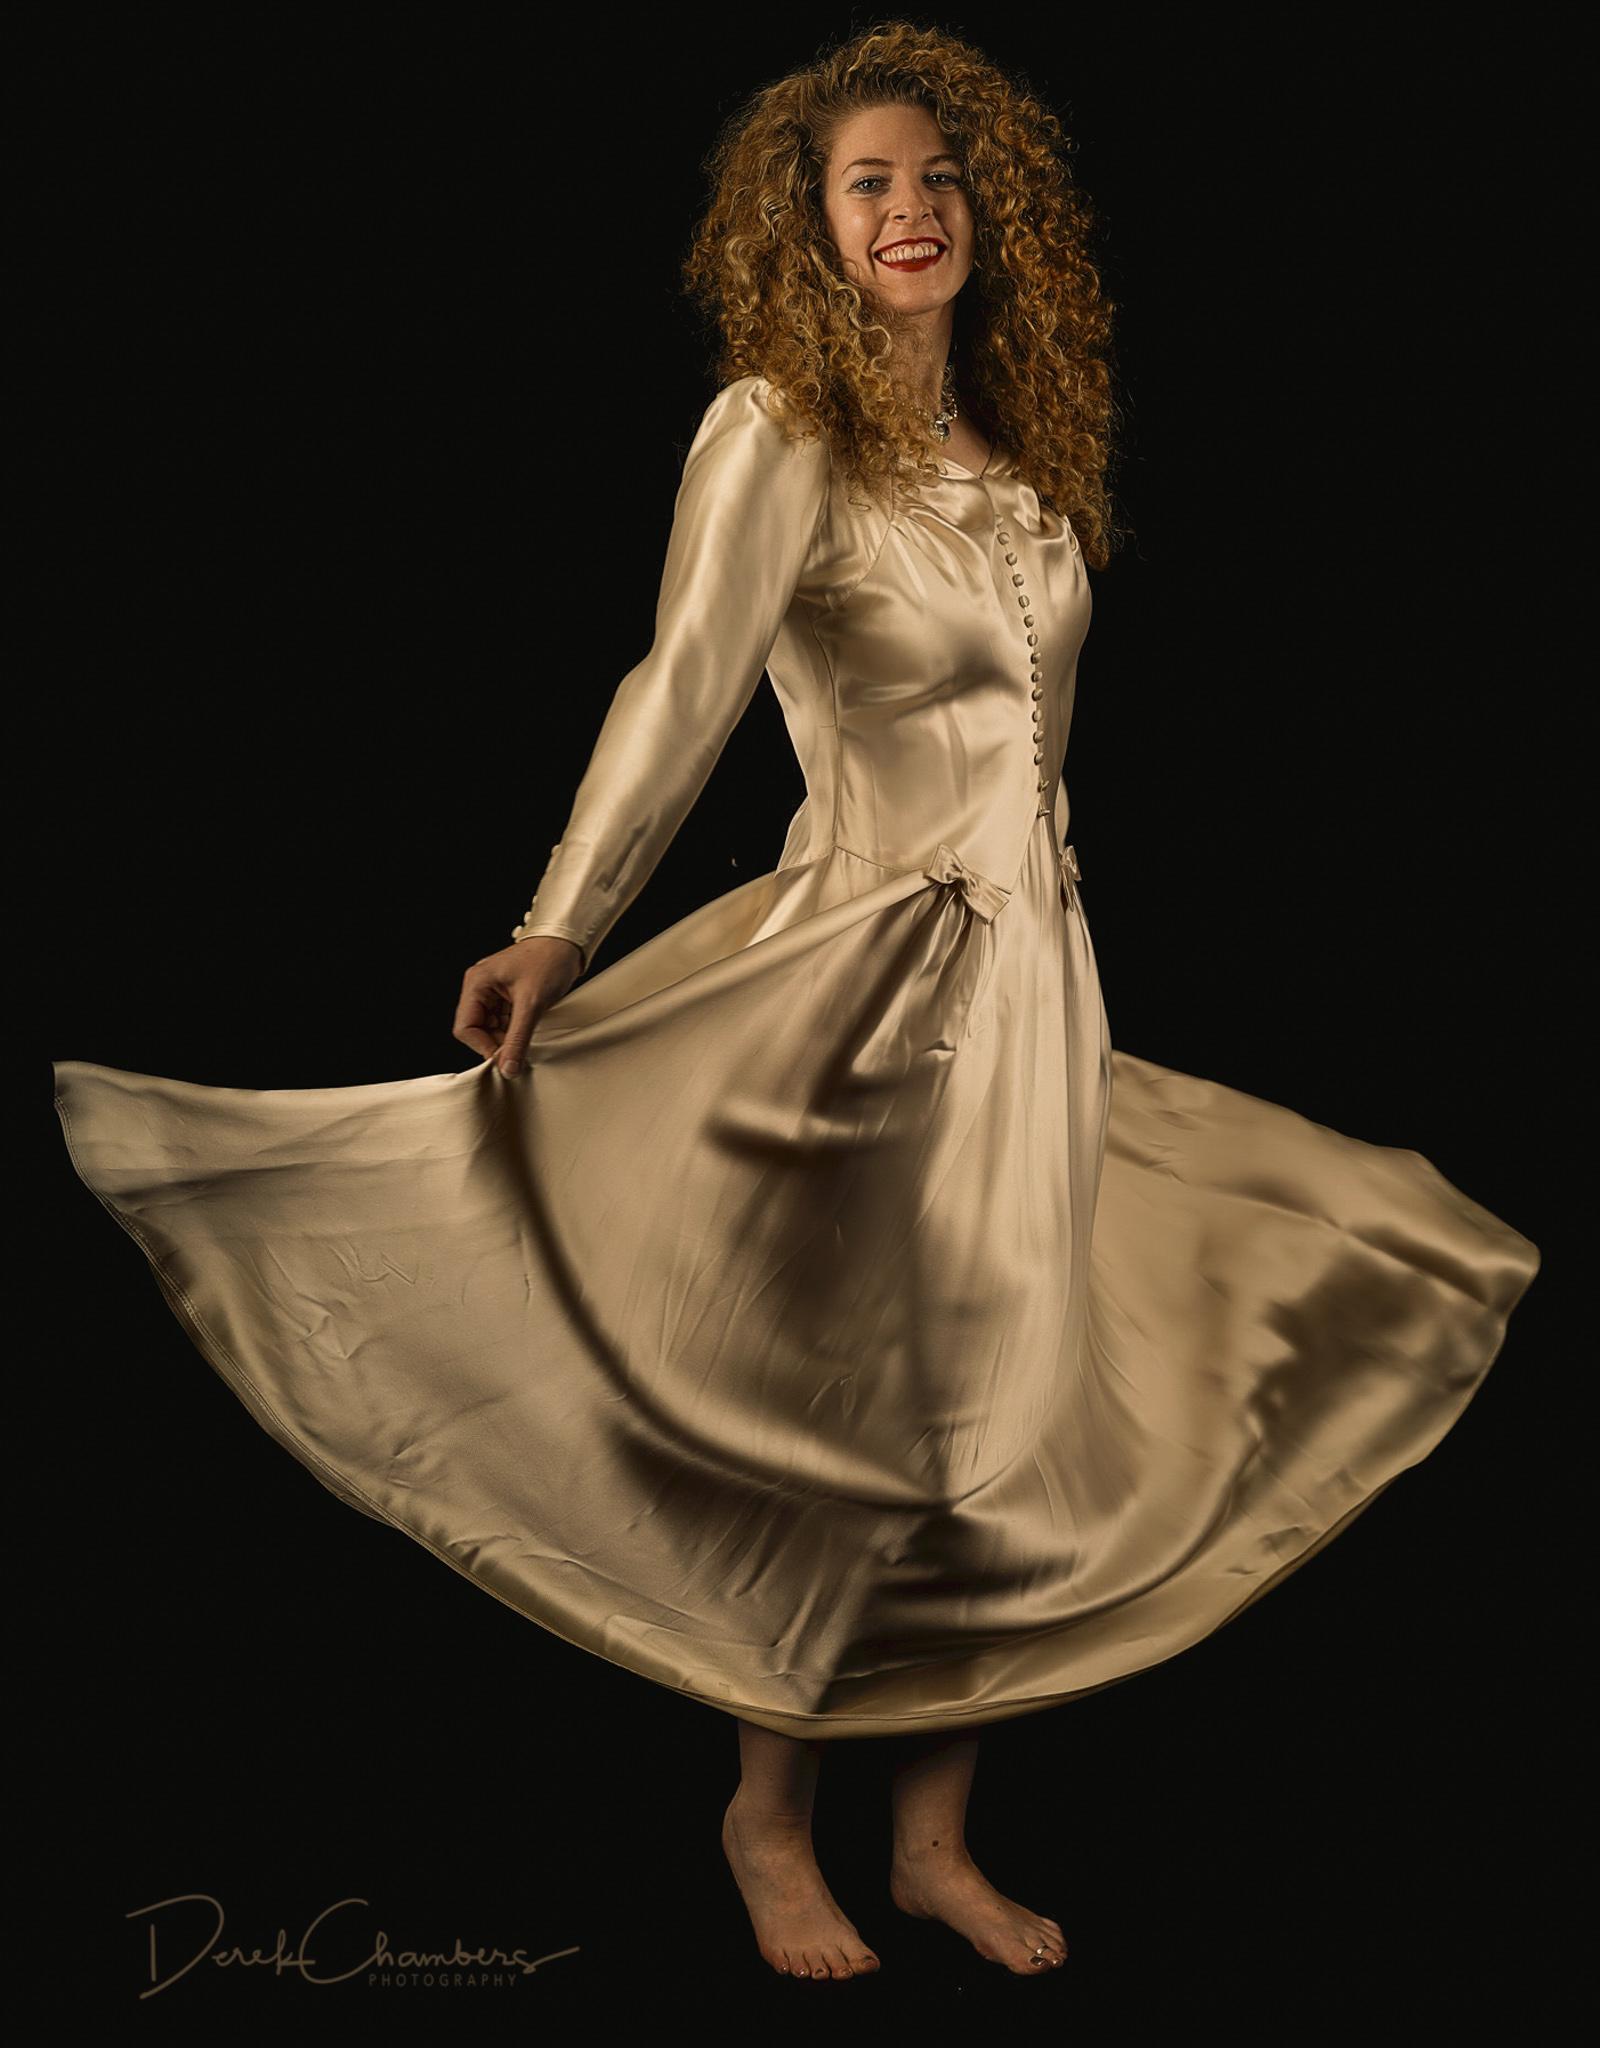 Kendra Cox and the Wedding Dress - Derek Chambers